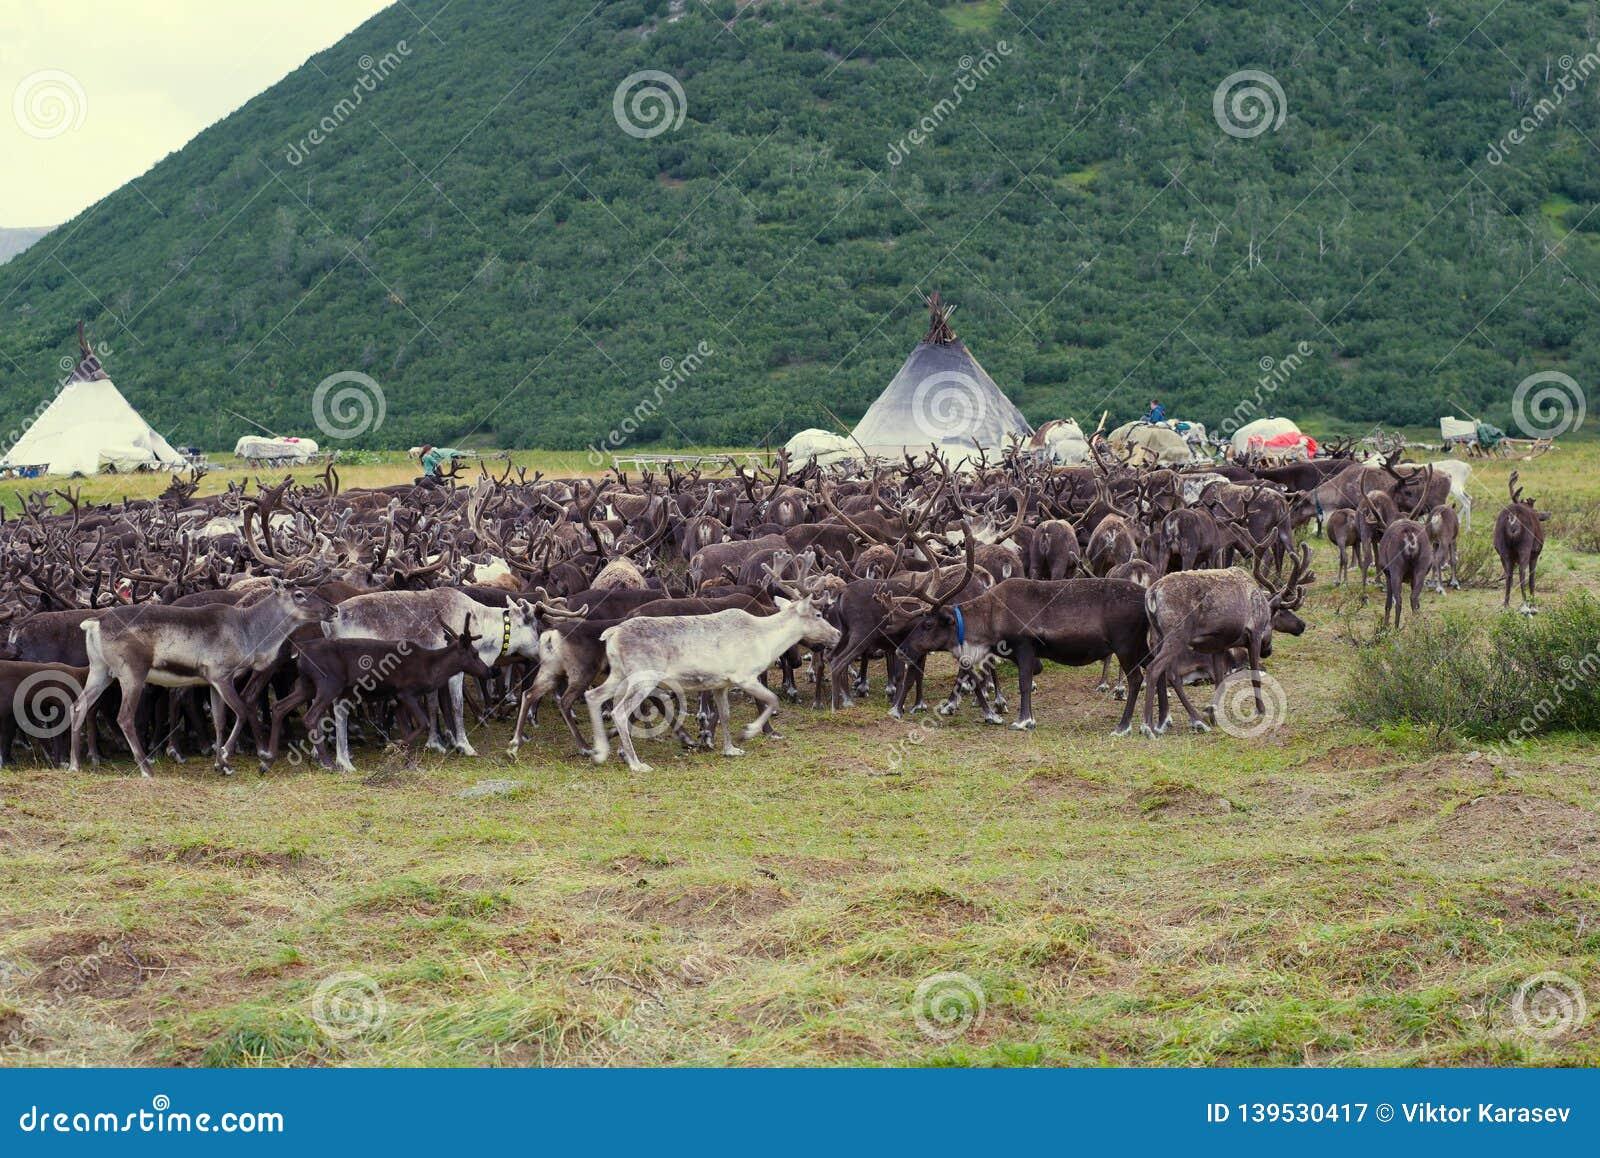 Herd of reindeers at a settlement of nomads reindeer breeders. Yamal